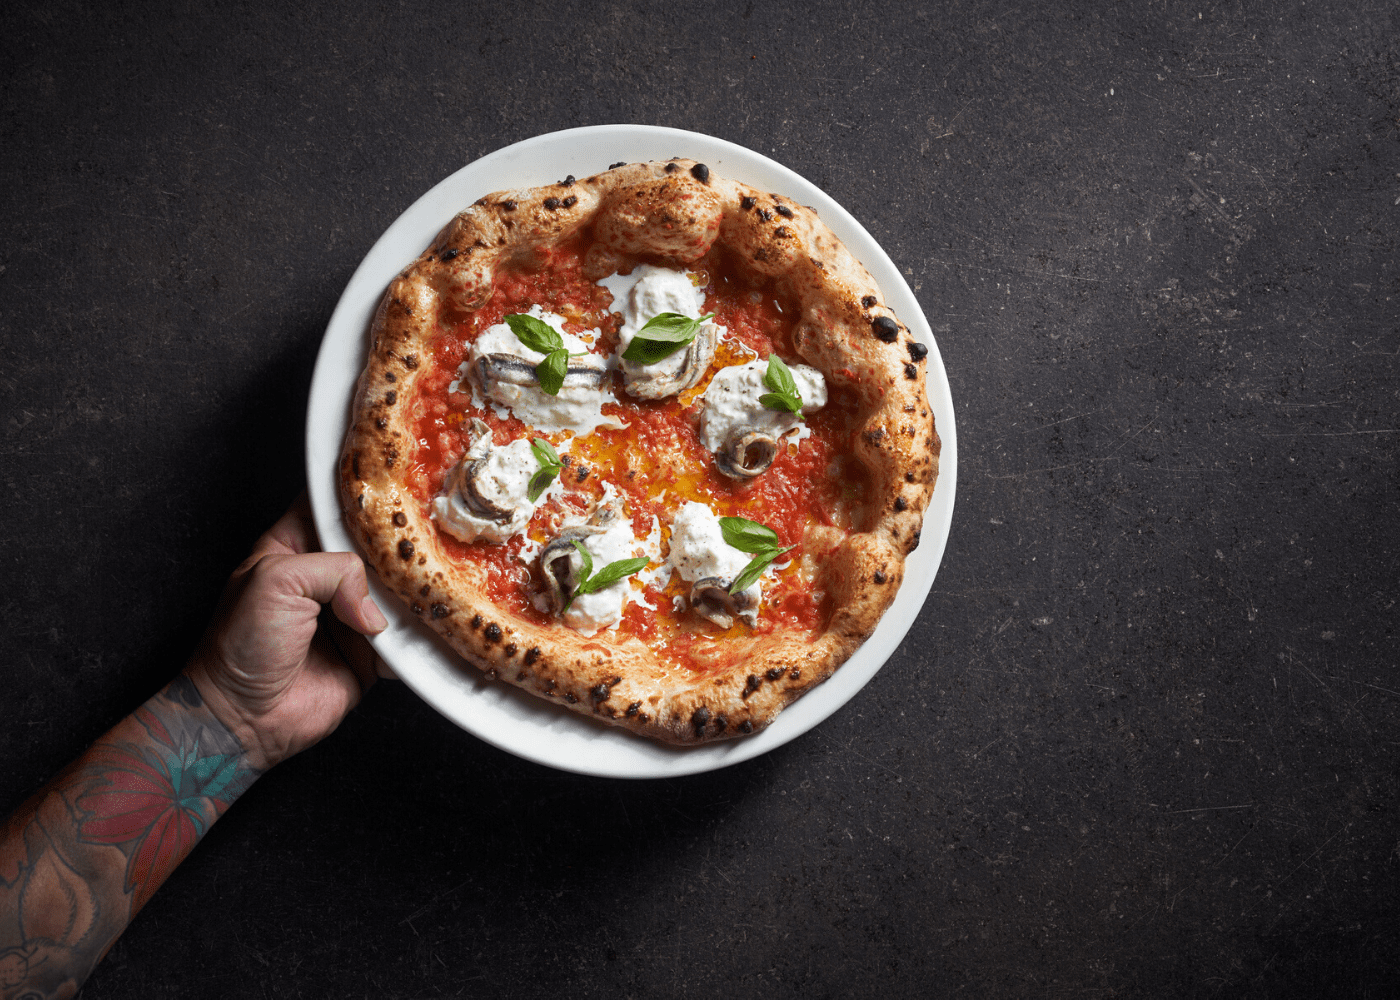 Cicheti-new-menu-Sicilian-inspired-Napoletana